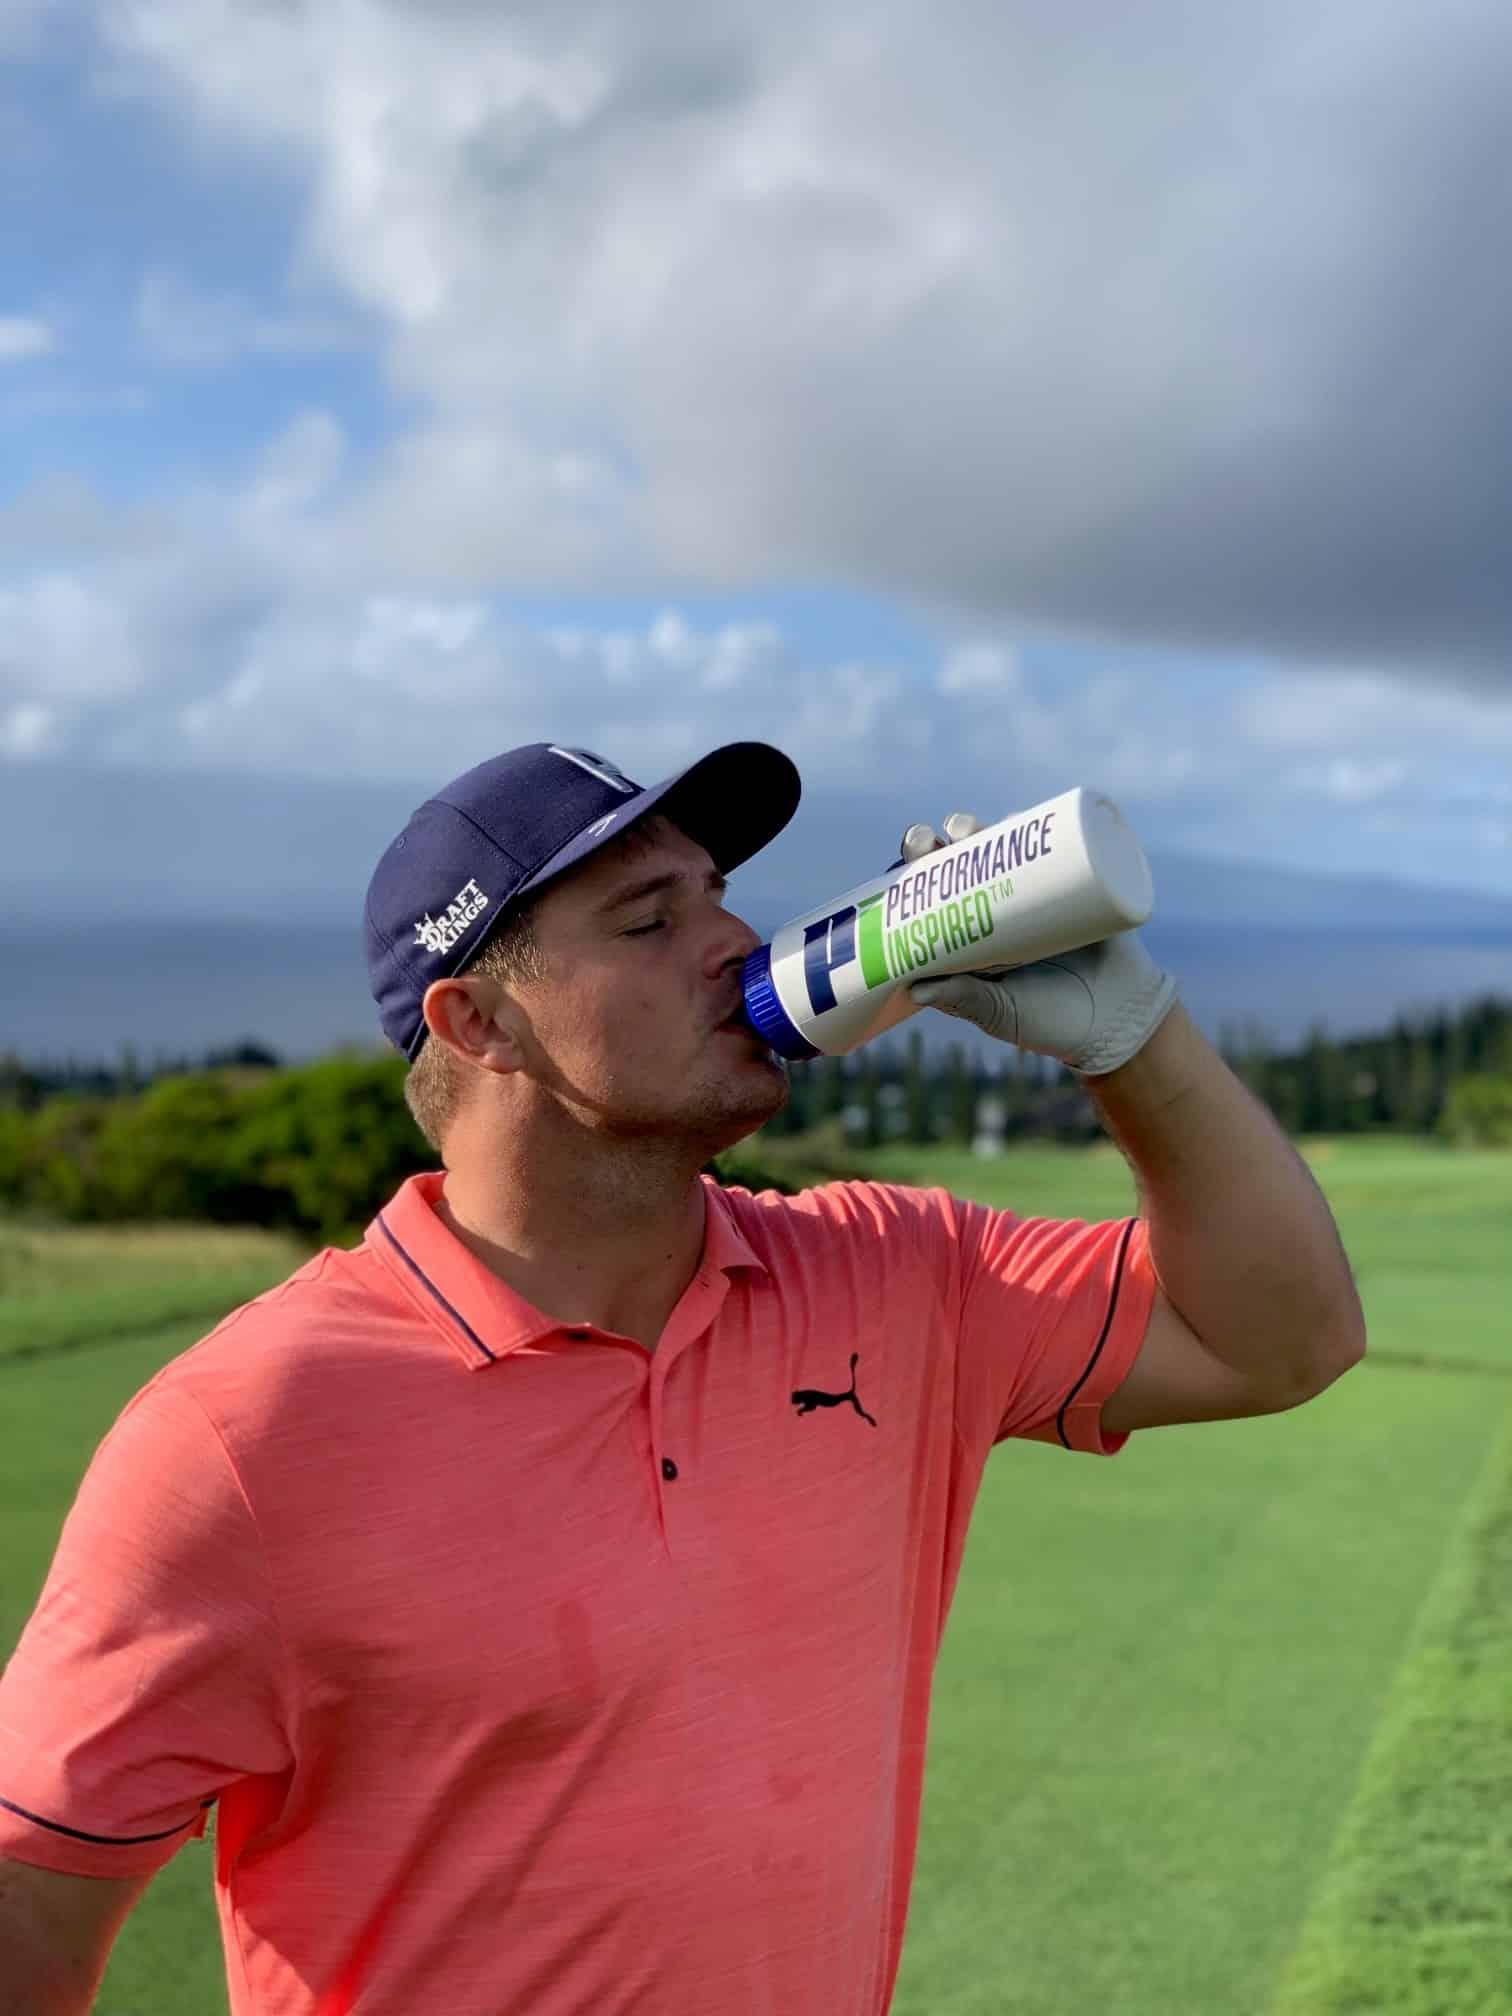 Bryson Dechambeau water bottle image